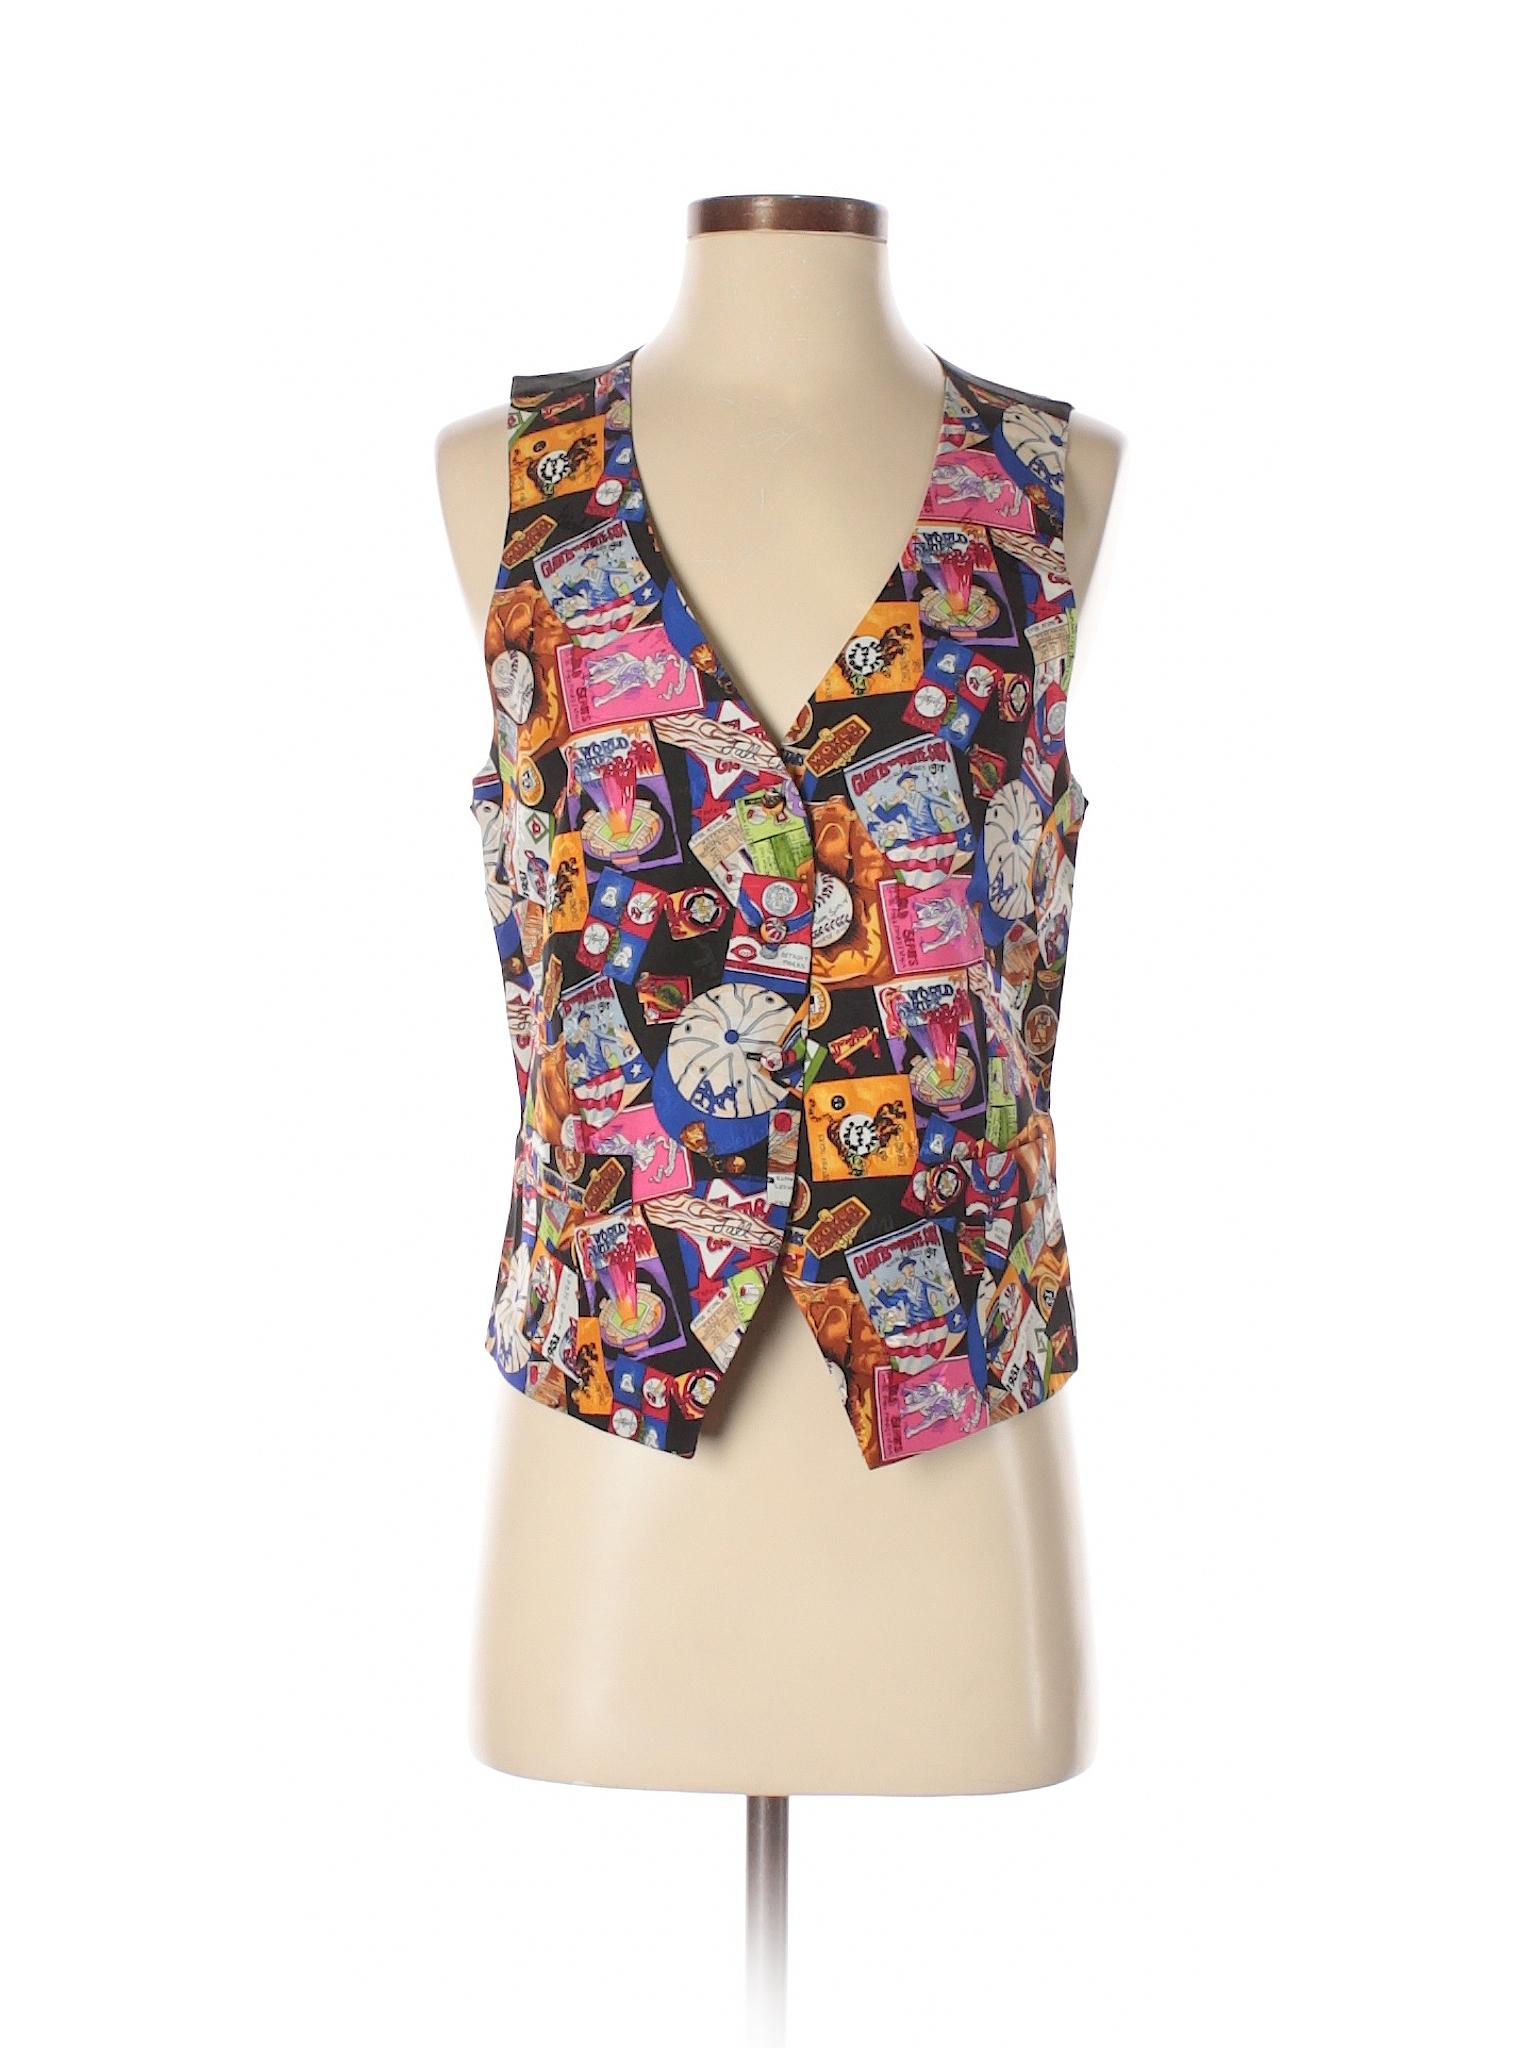 Vest Tuxedo Miller Nicole winter Boutique qwK6PTIKCx